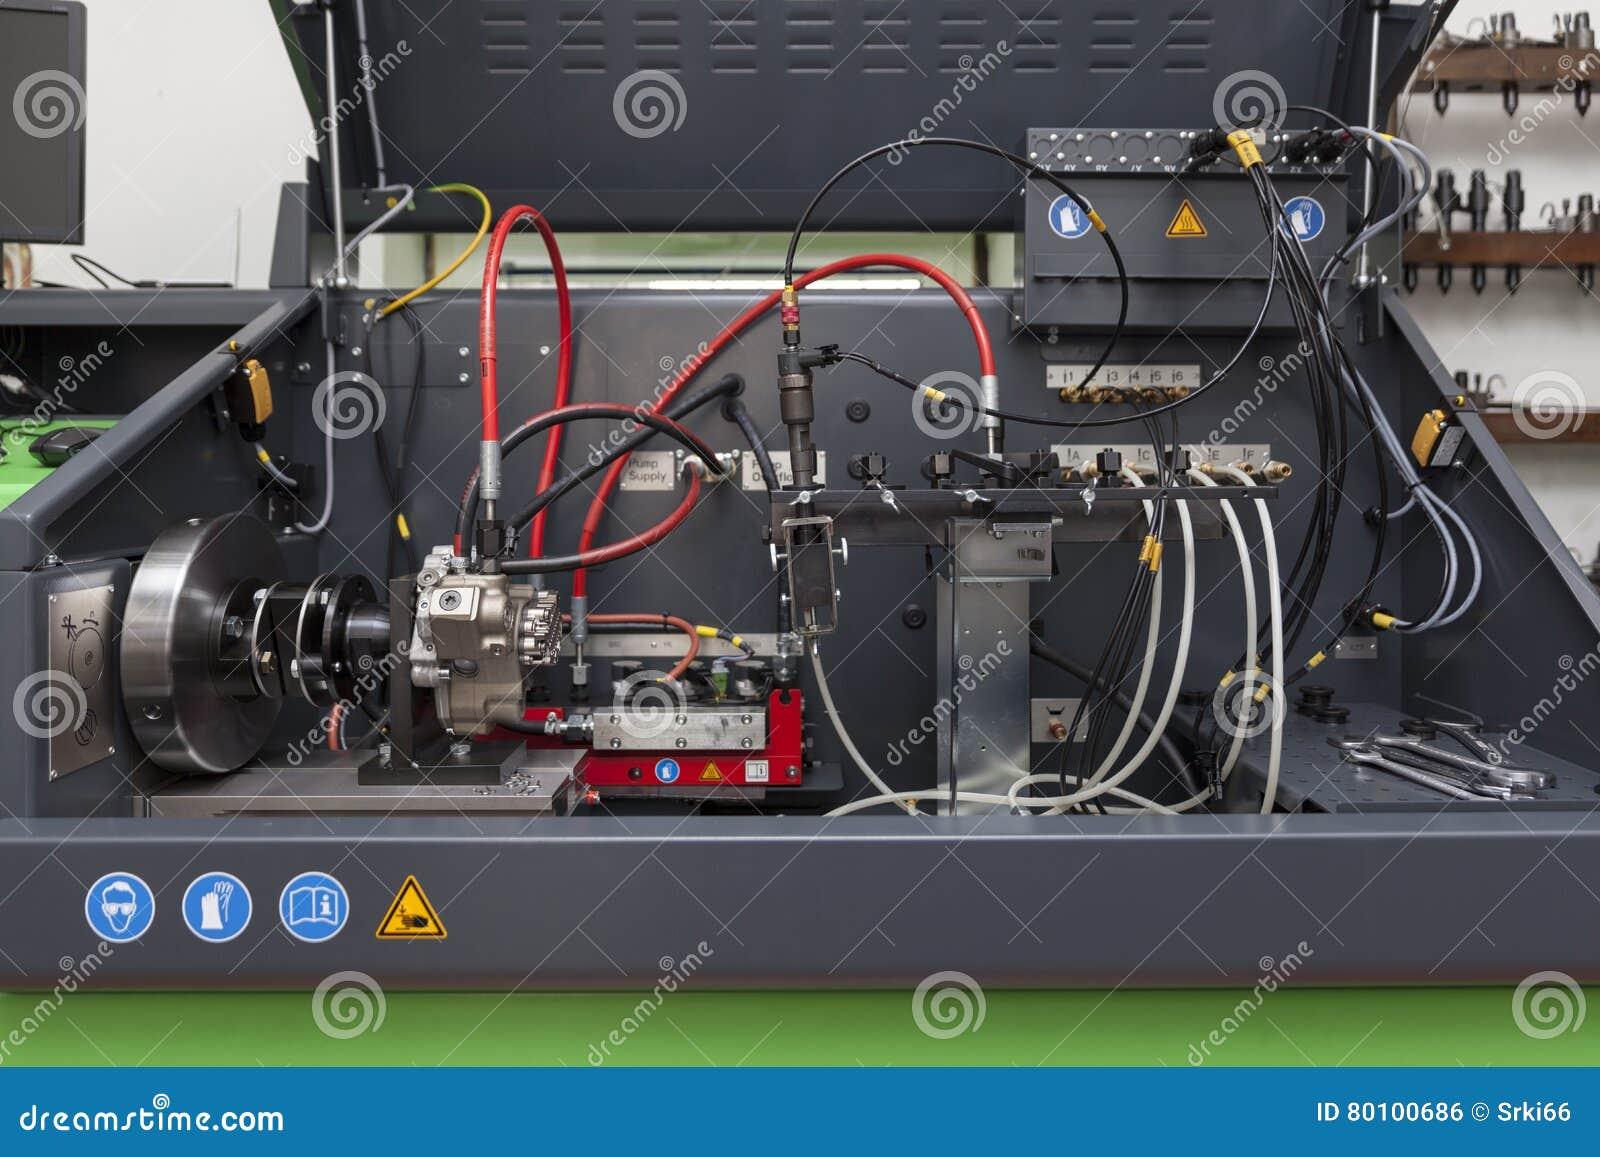 Repare bocais para os motores diesel